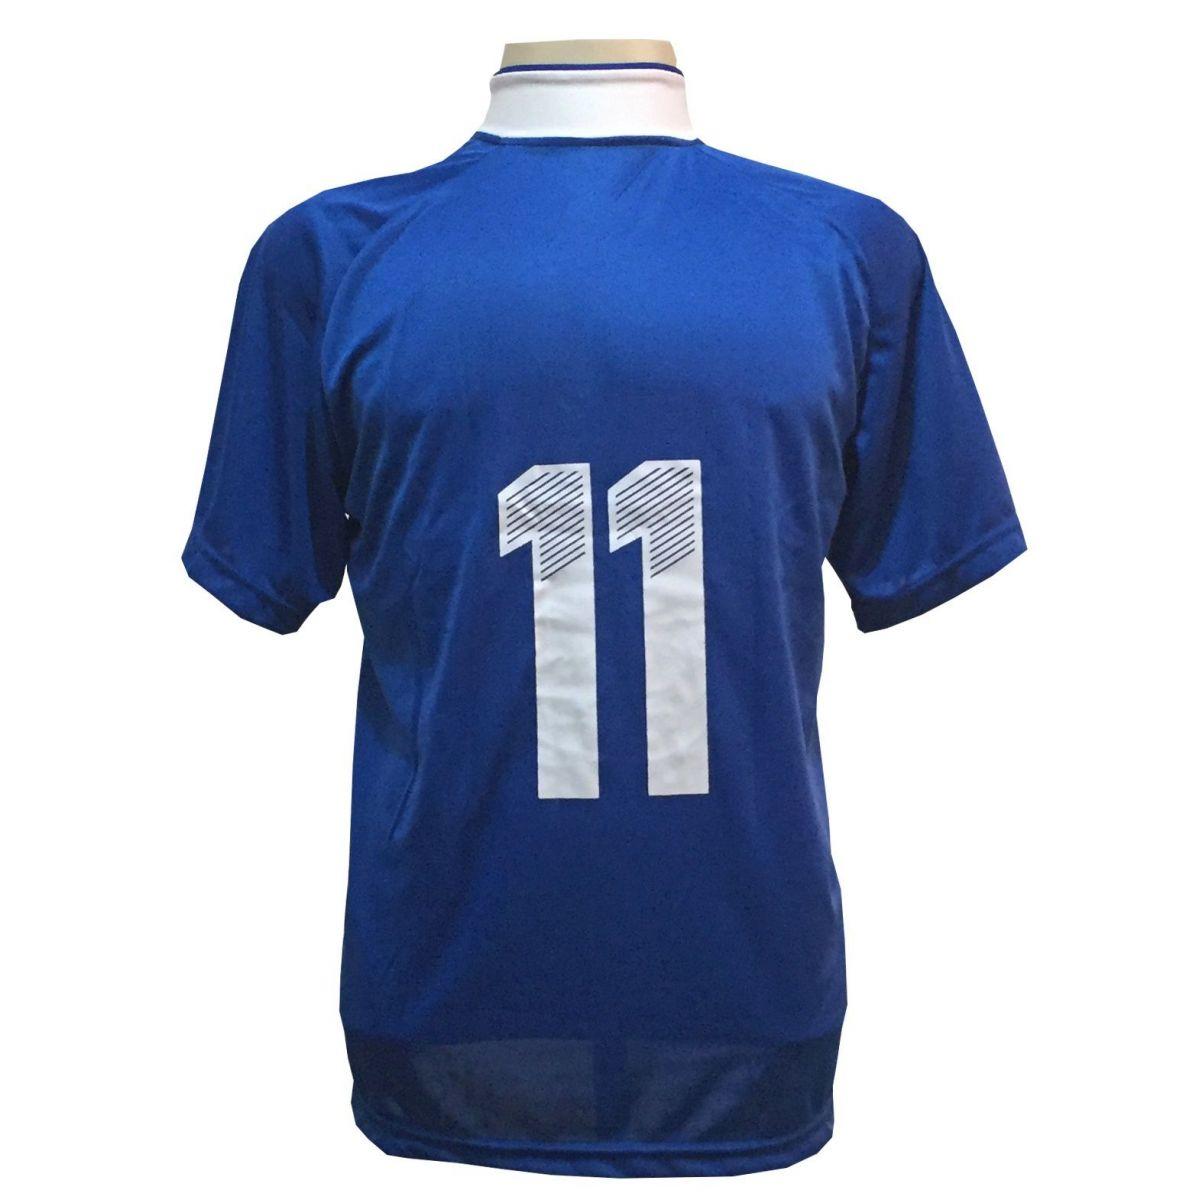 Jogo de Camisa com 18 unidades modelo Milan Royal/Branco + 1 Goleiro + Brindes